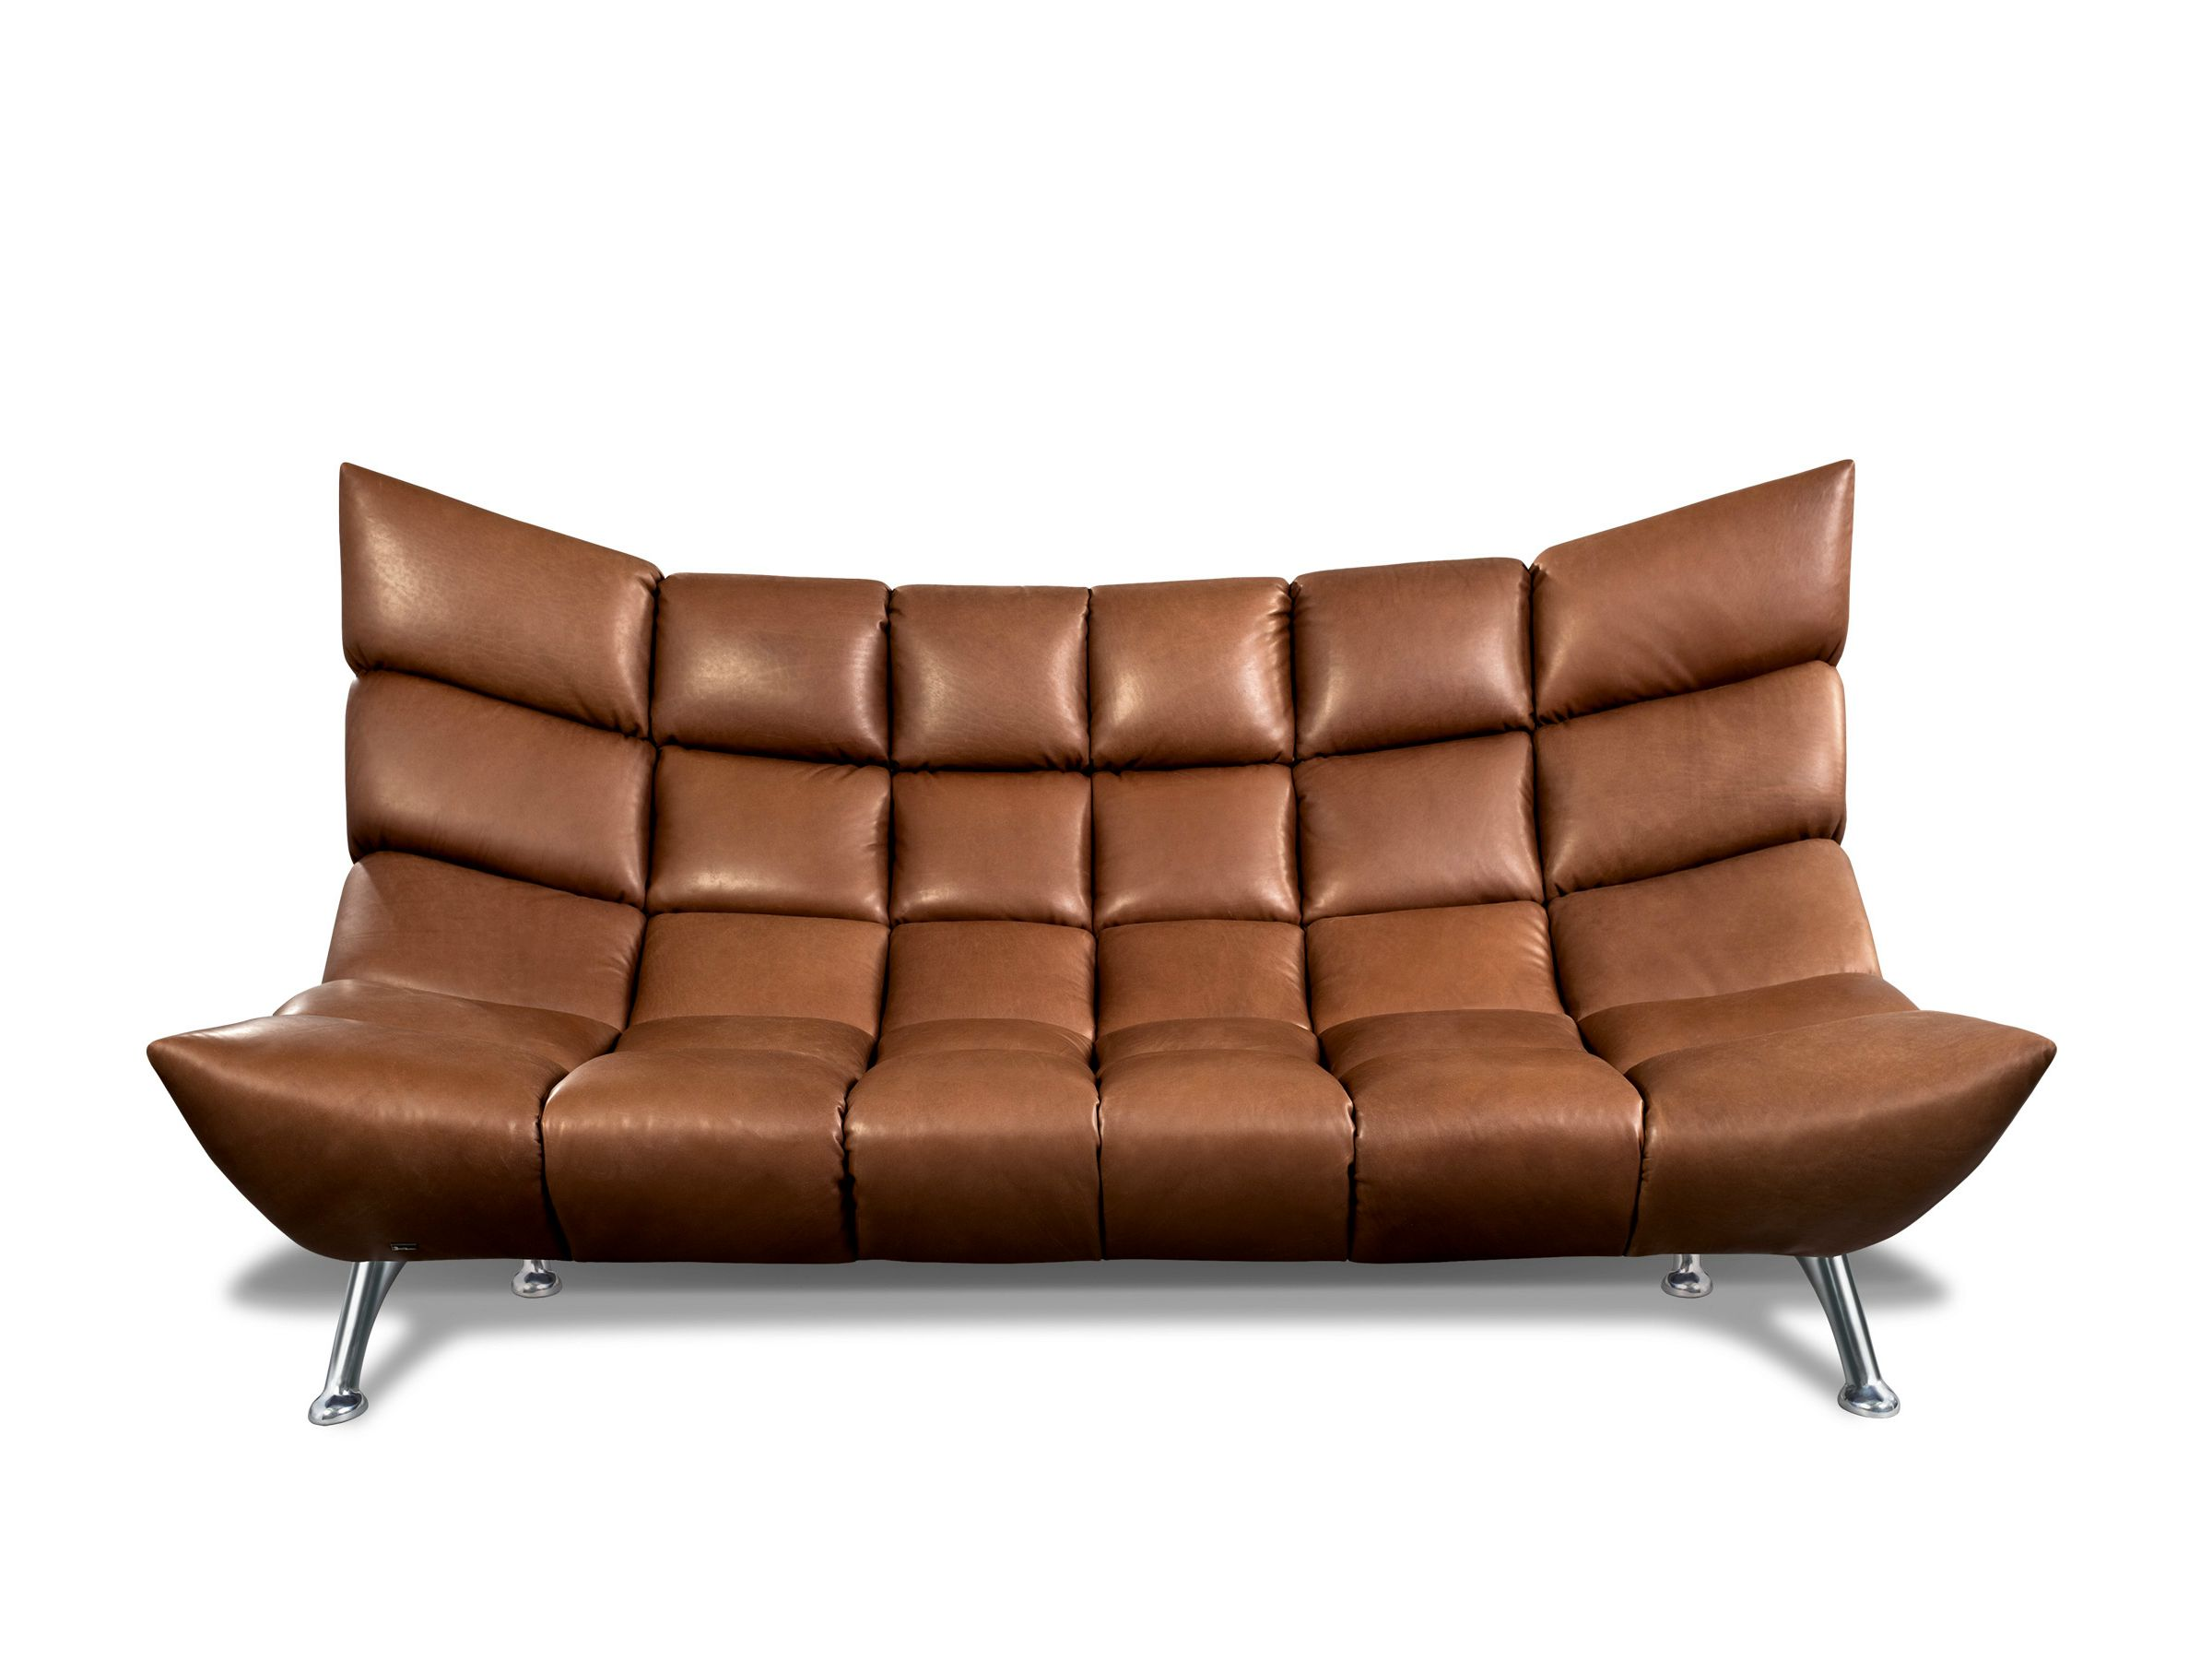 Divan Kollekciya Hangout By Bretz Wohntraume Dizajn Meera Leona Rathai Sofa Armchair Furniture Furniture Design